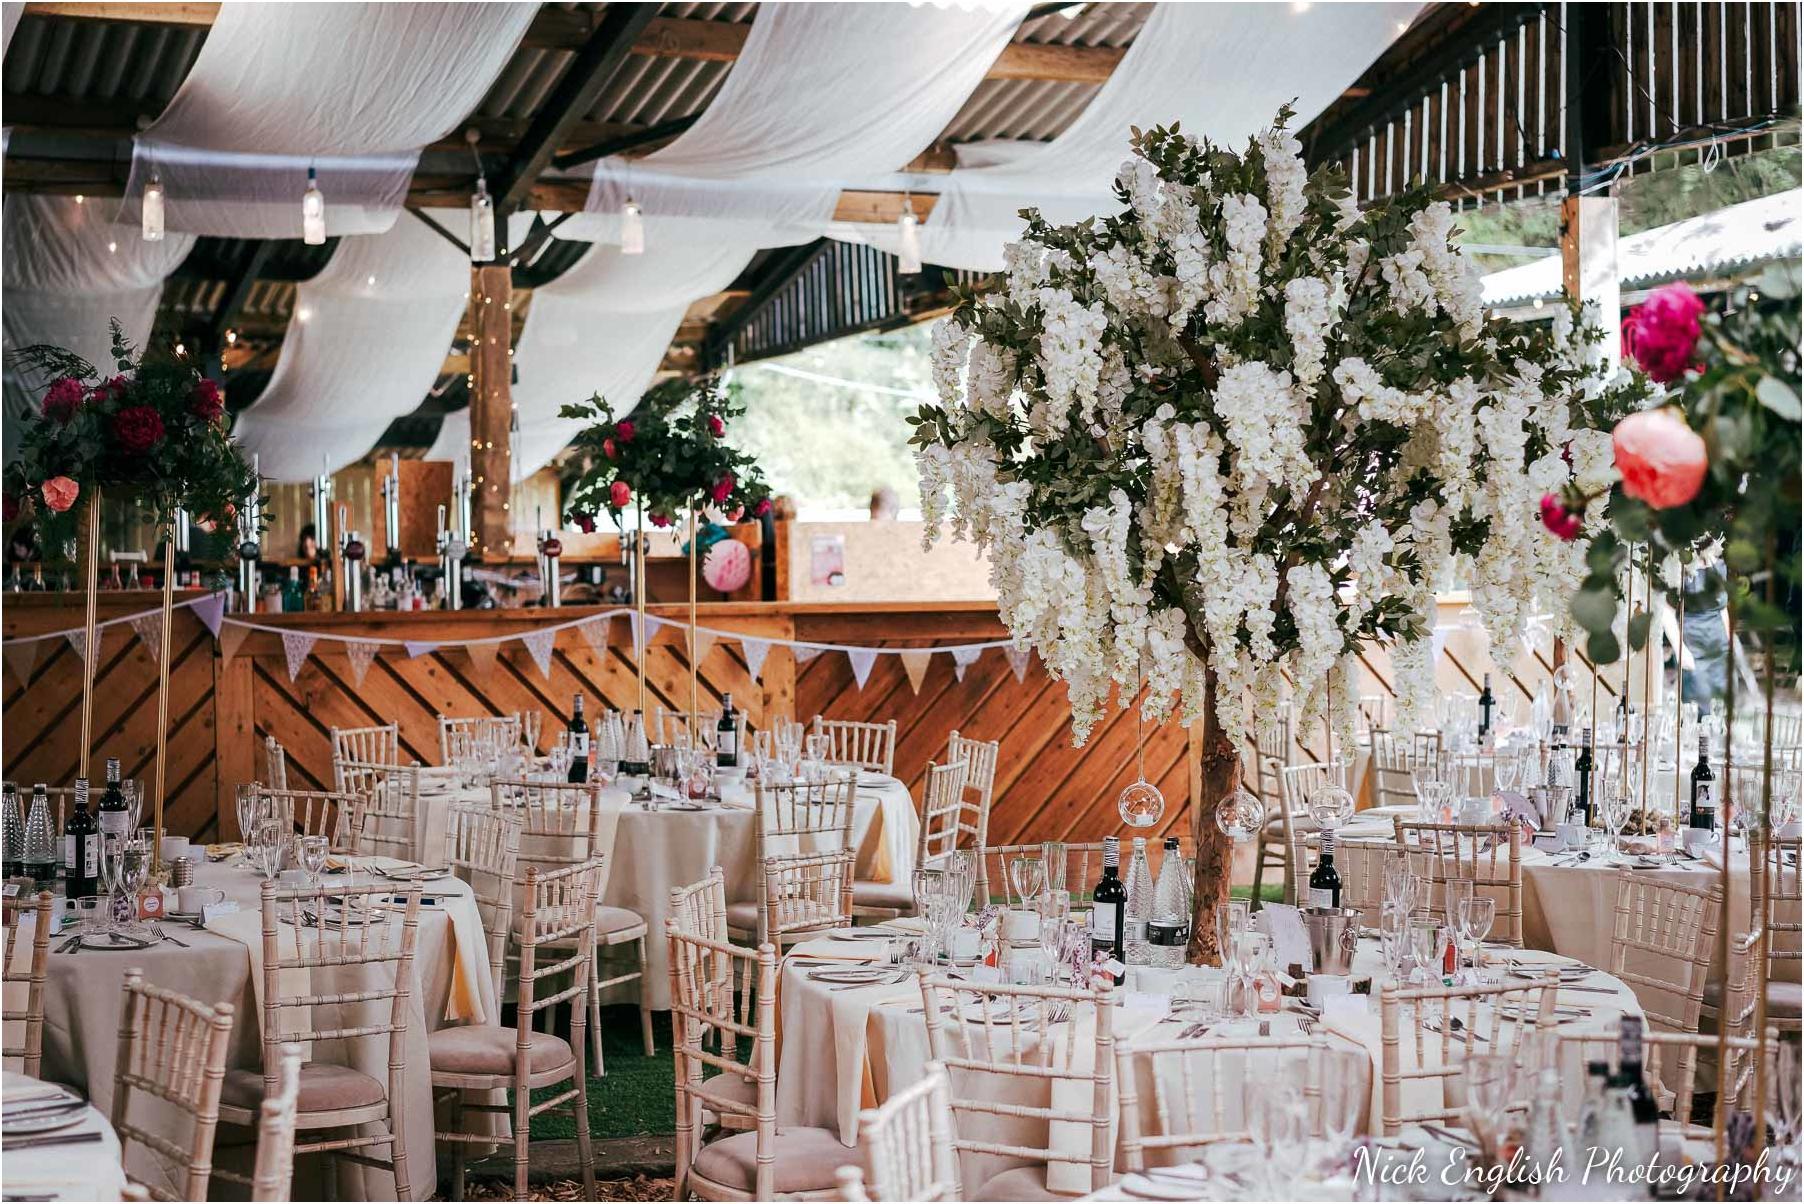 Whitebottom_Farm_Wedding_Manchester_Photograph-54.jpg